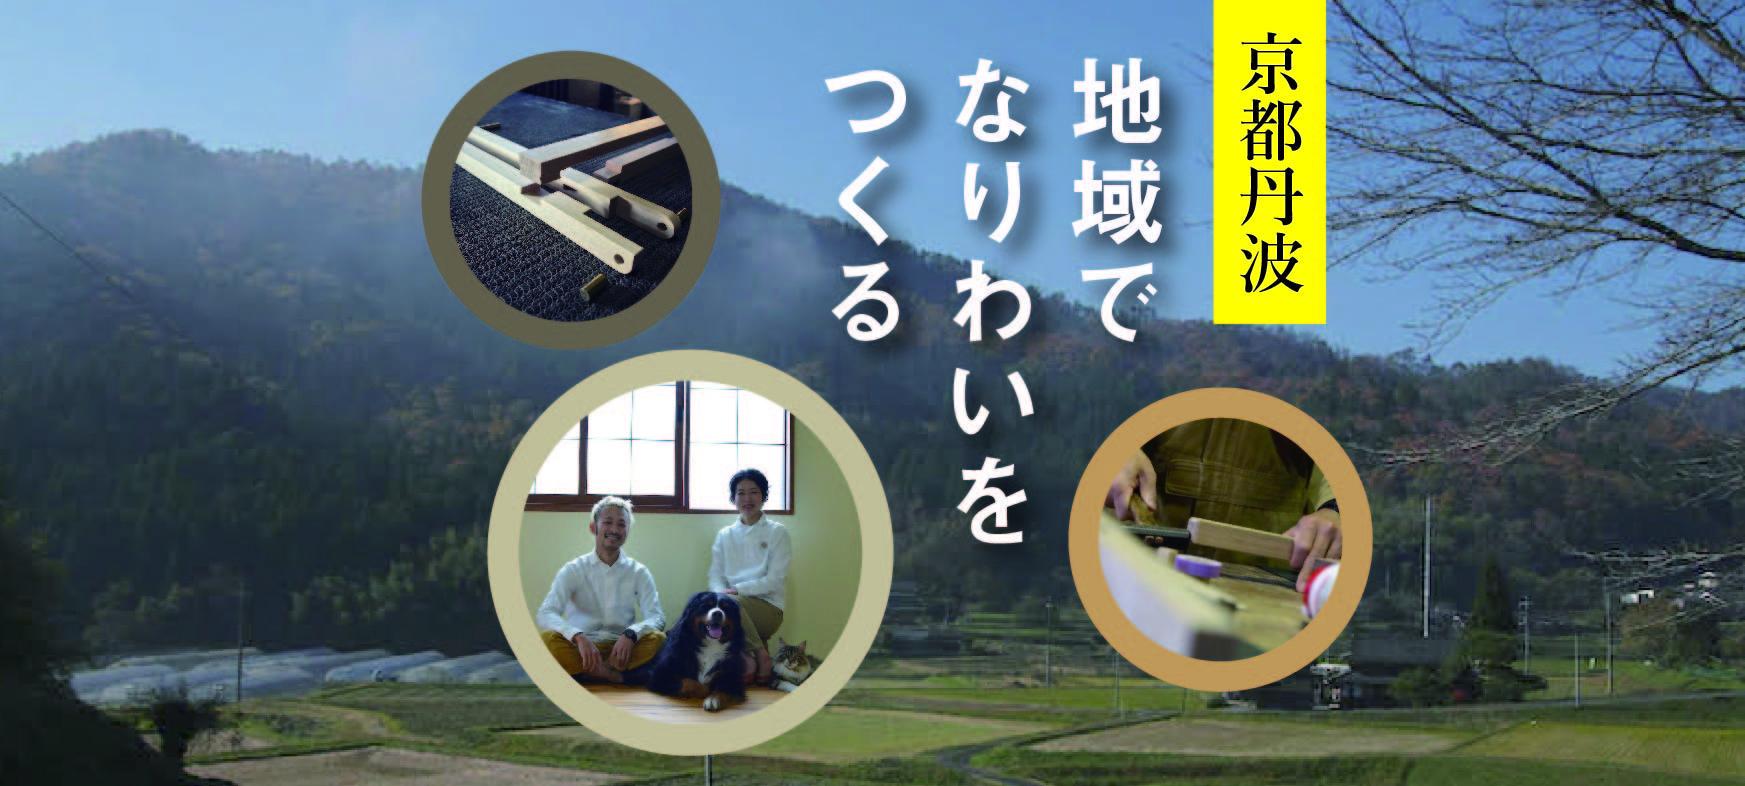 190126_event_kyototamba